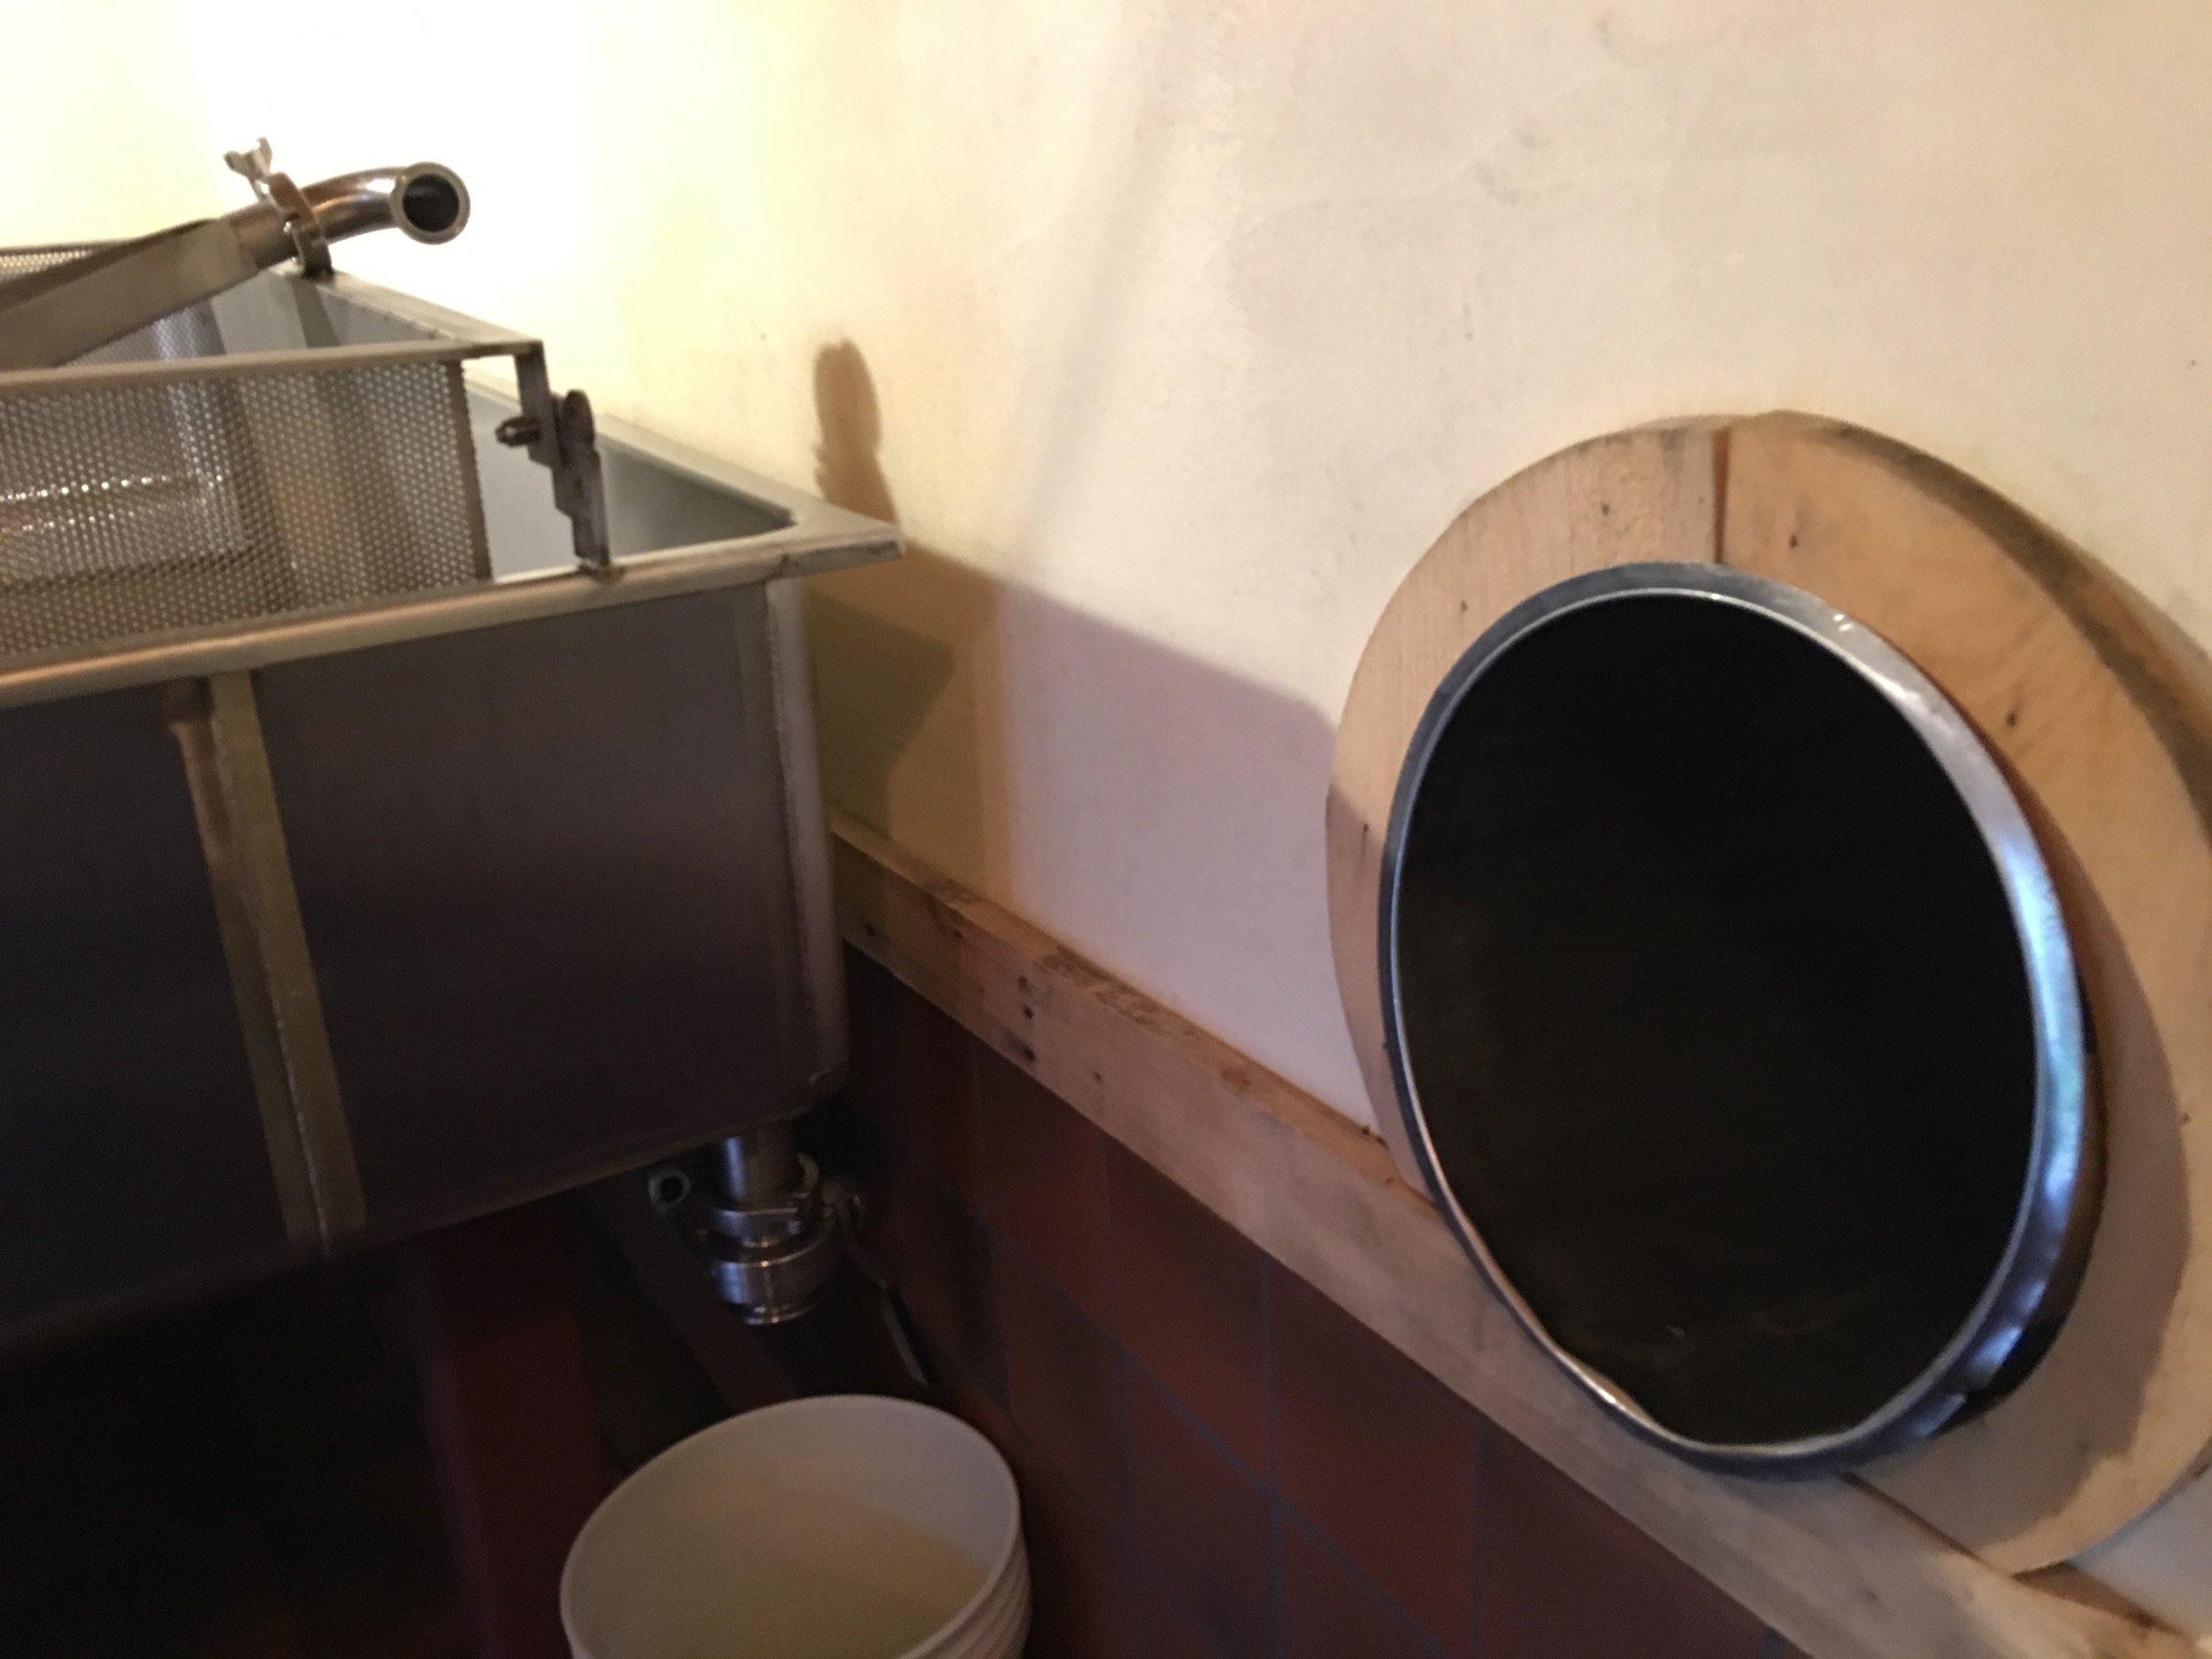 Beer glory hole